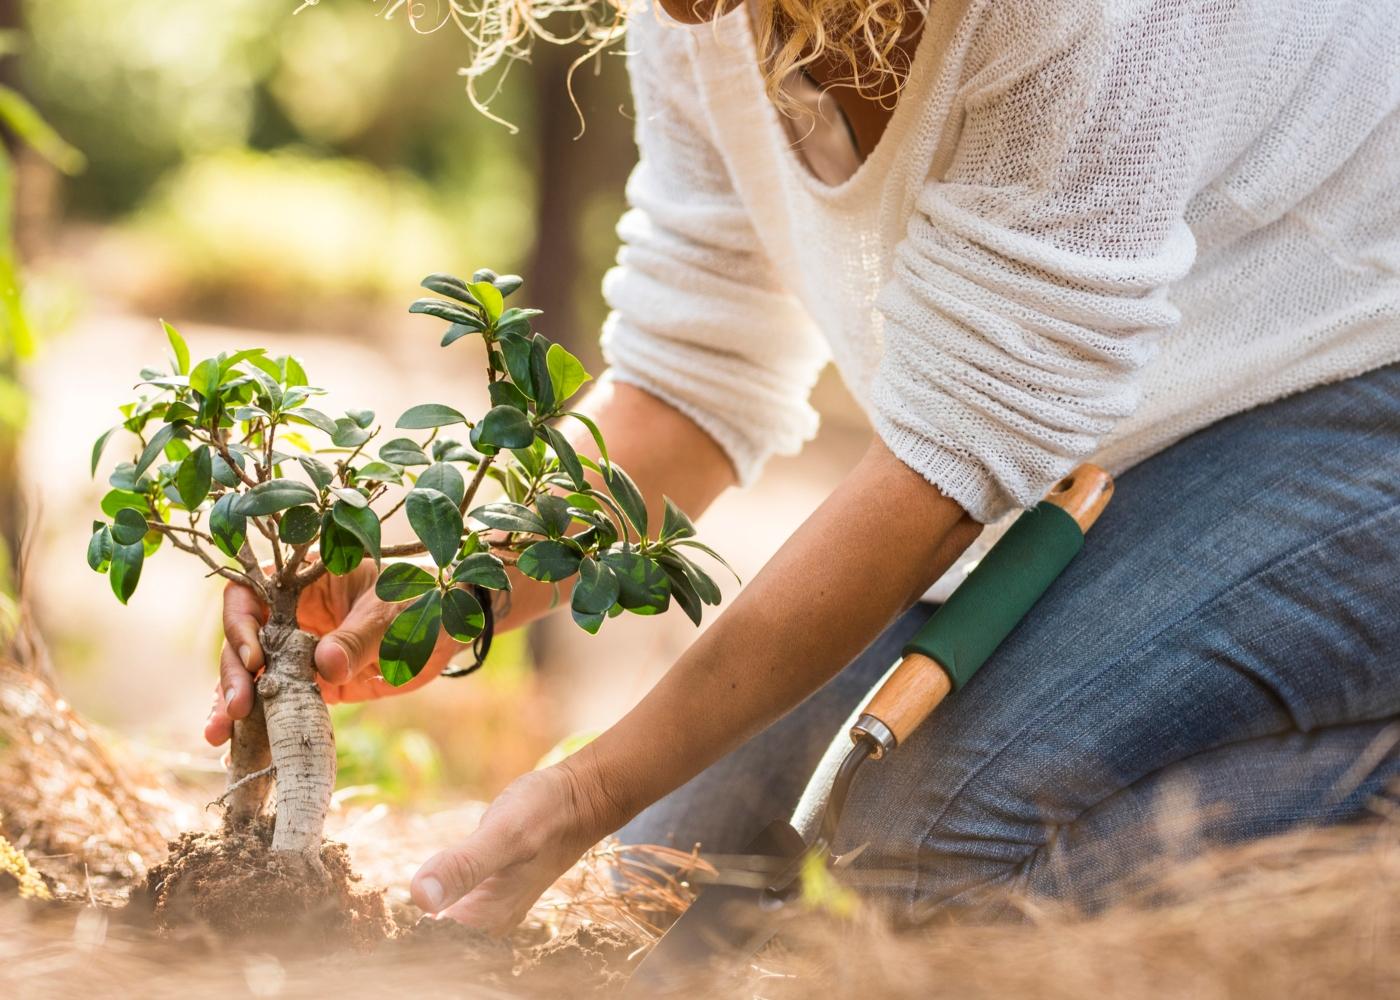 Mulher a plantar árvore